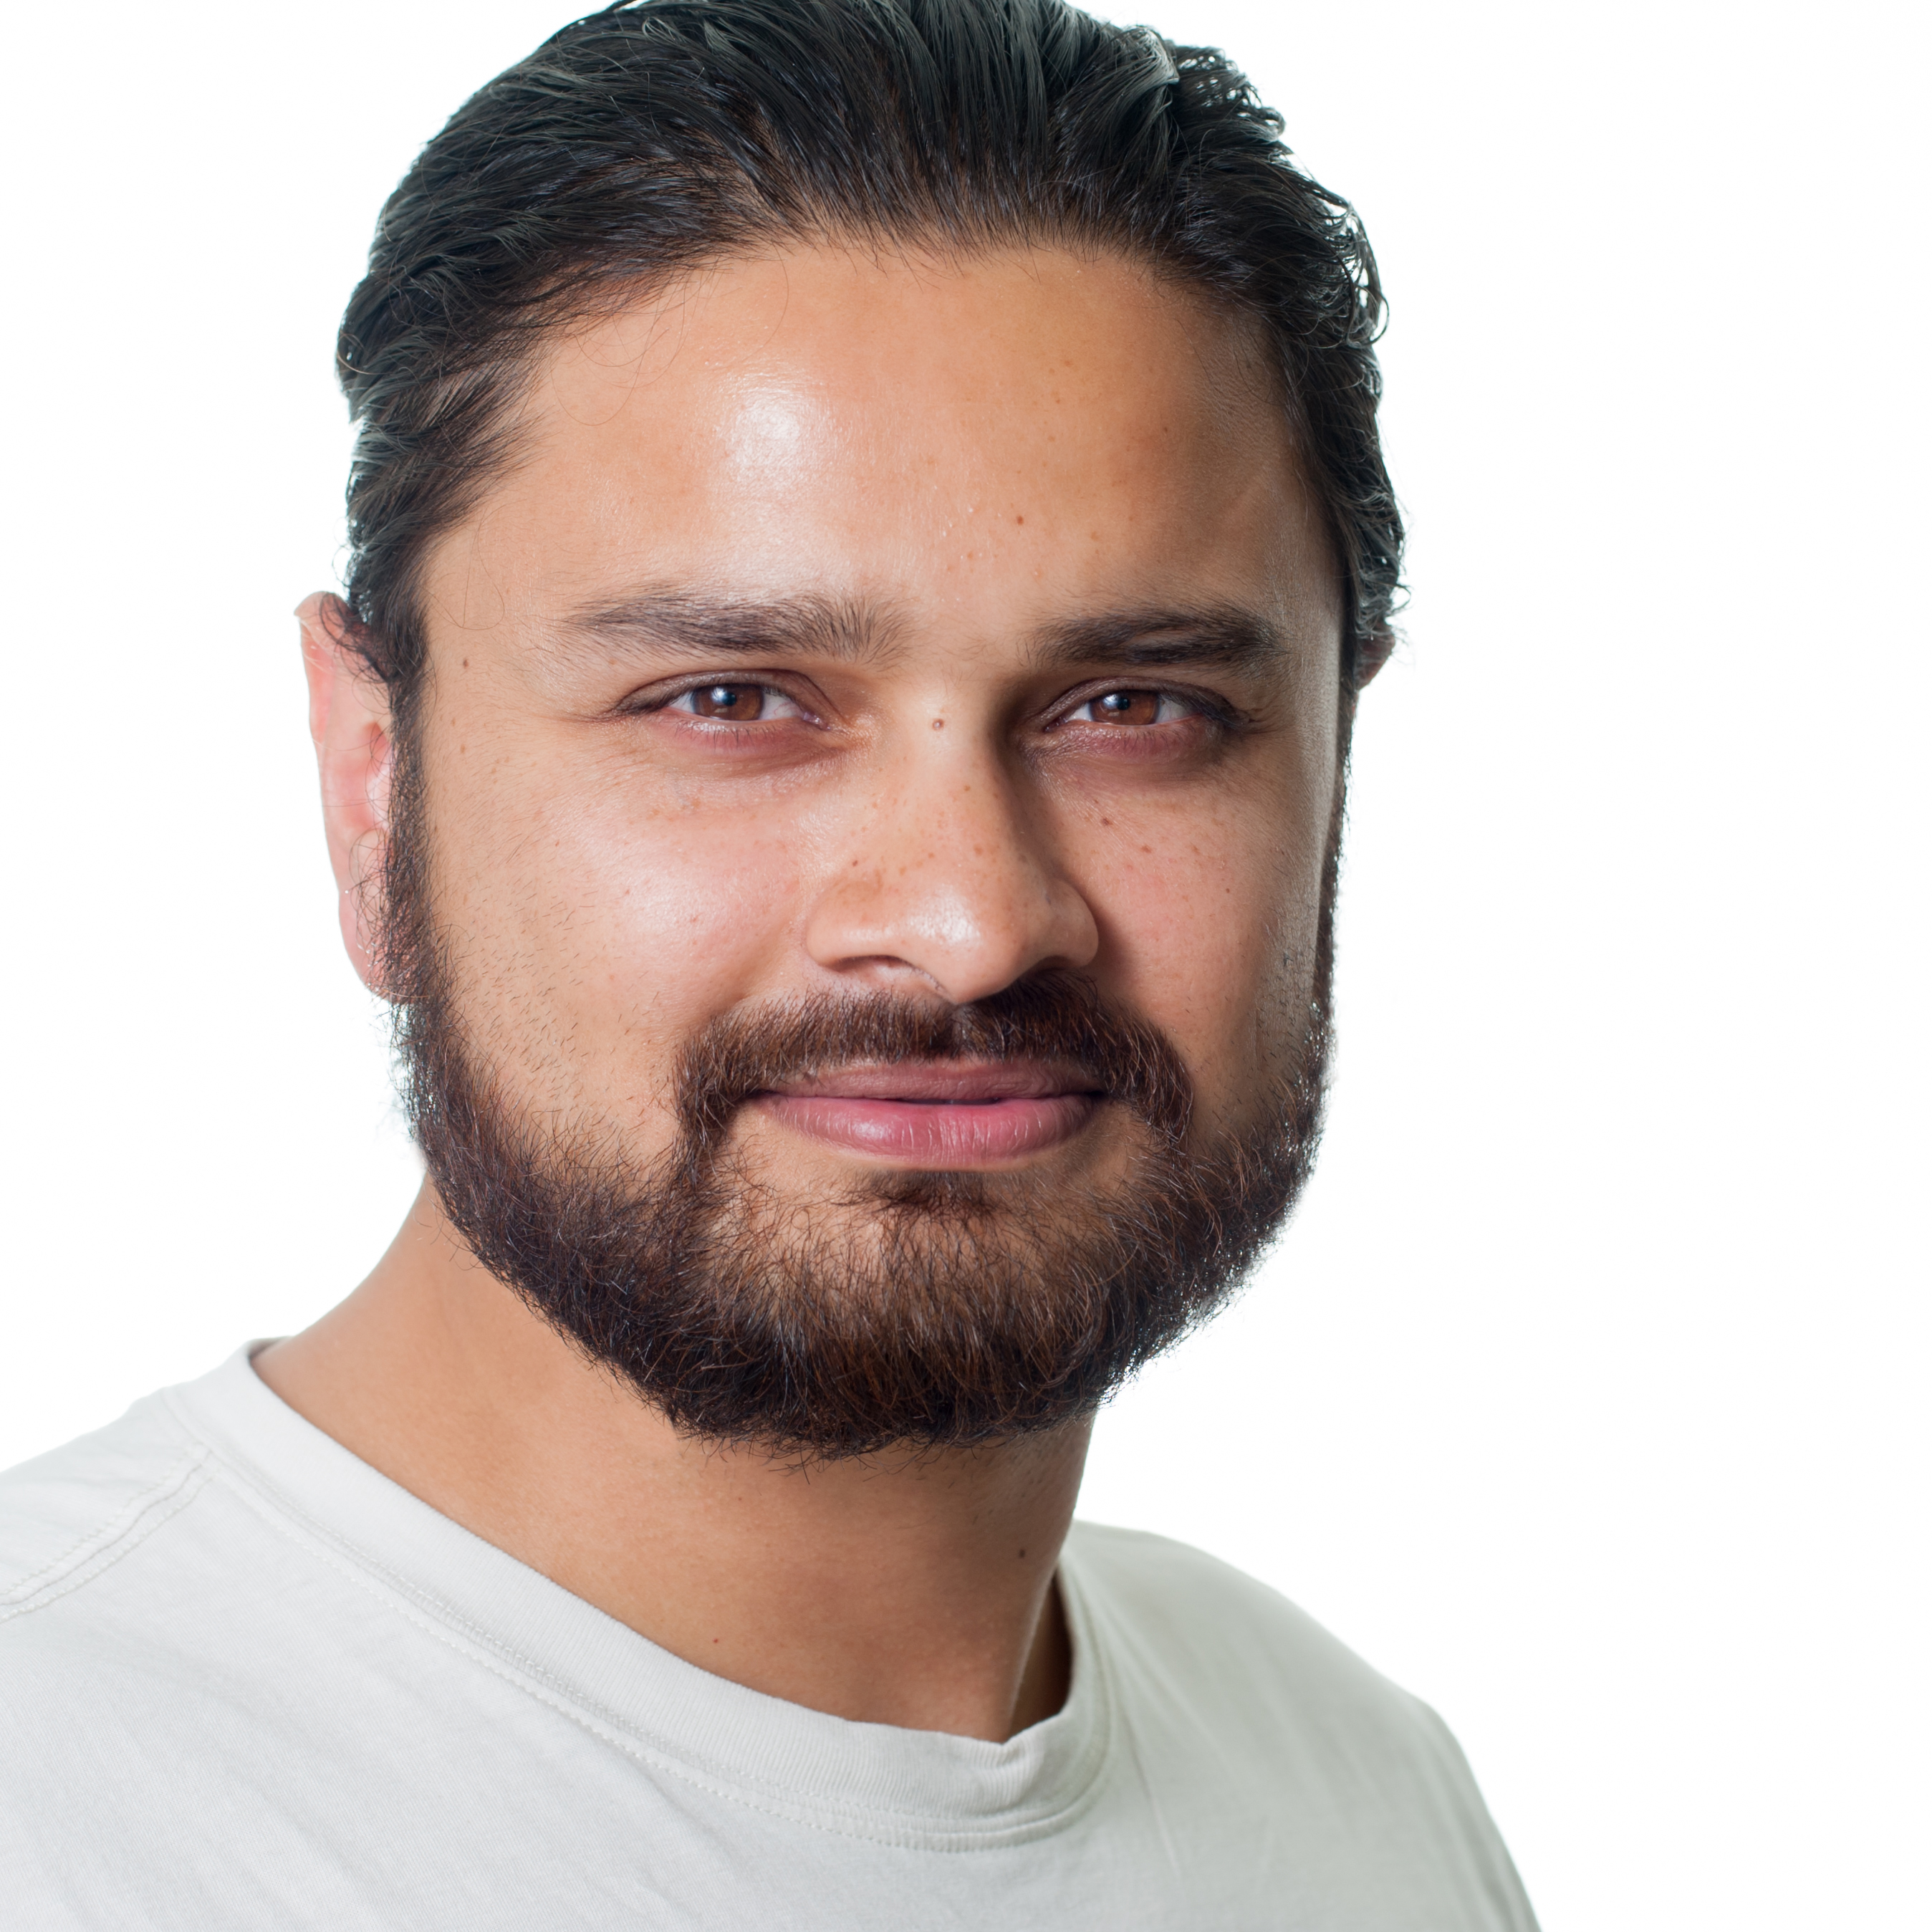 LosAngeles_Armughan-Syed_-_Armughan_Syed.jpg